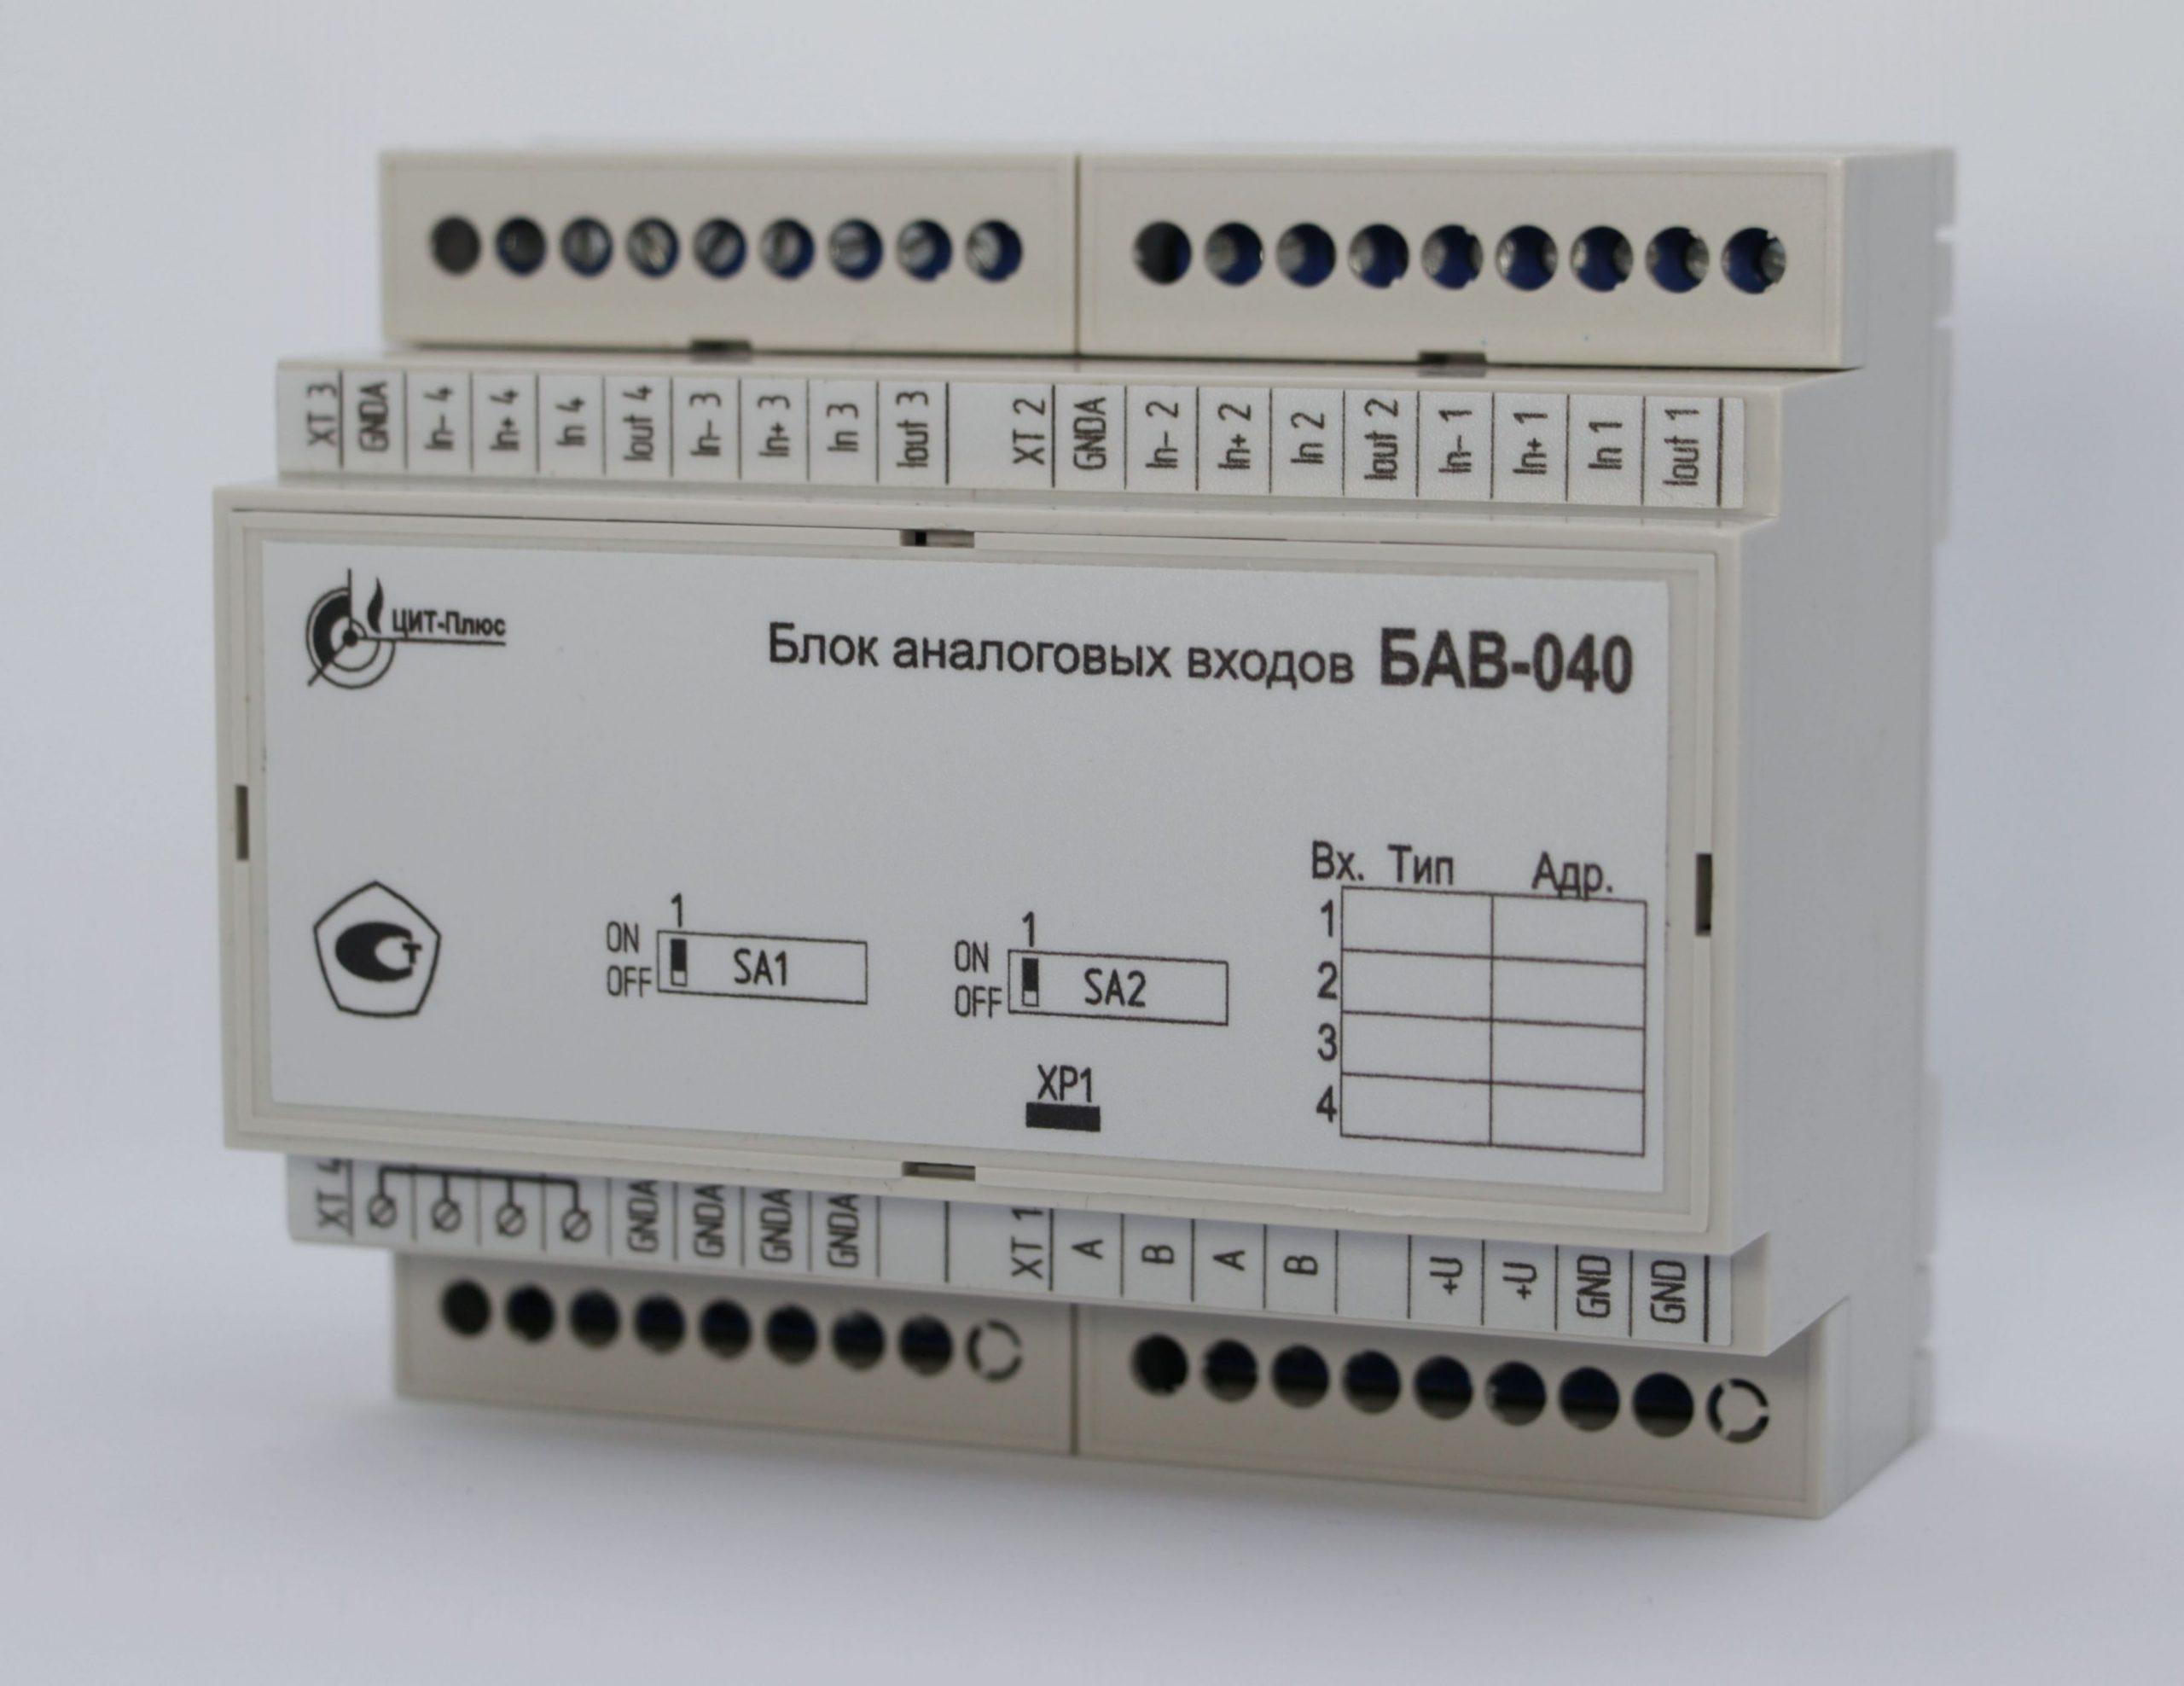 Блок аналоговых входов БАВ-040